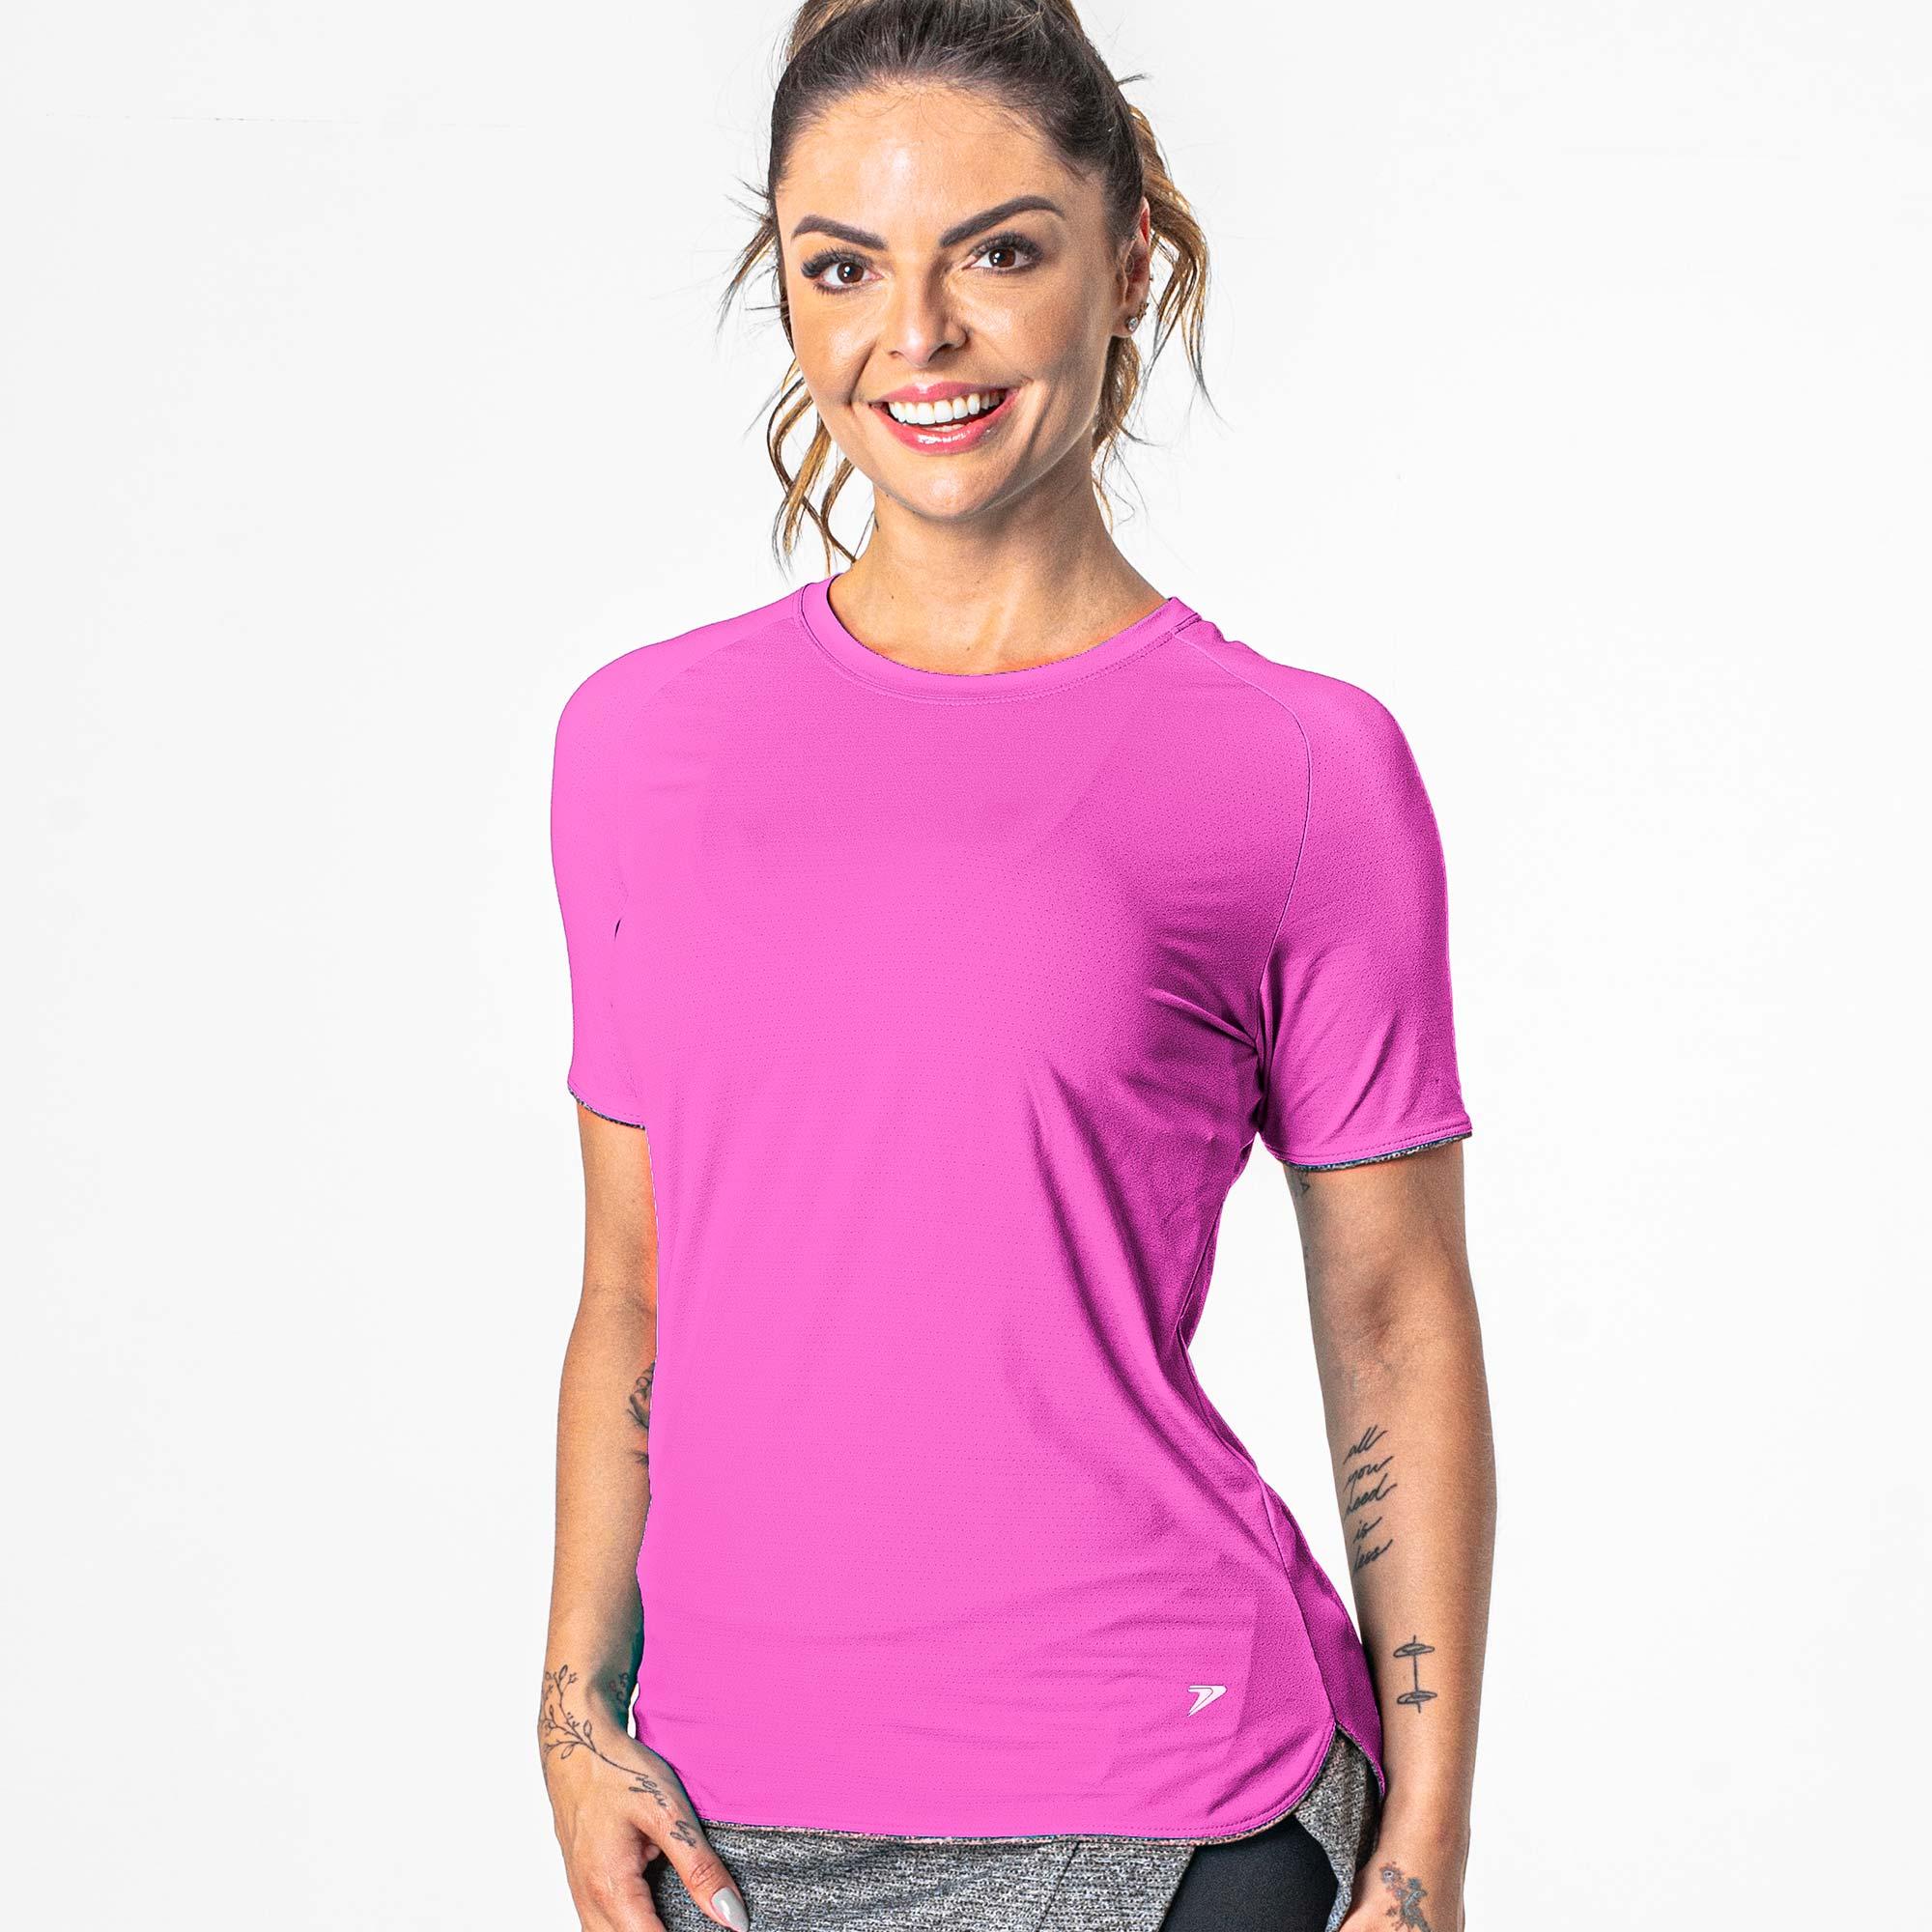 Camiseta Comfort Poliamida Runner Feminina Manga Curta 04261